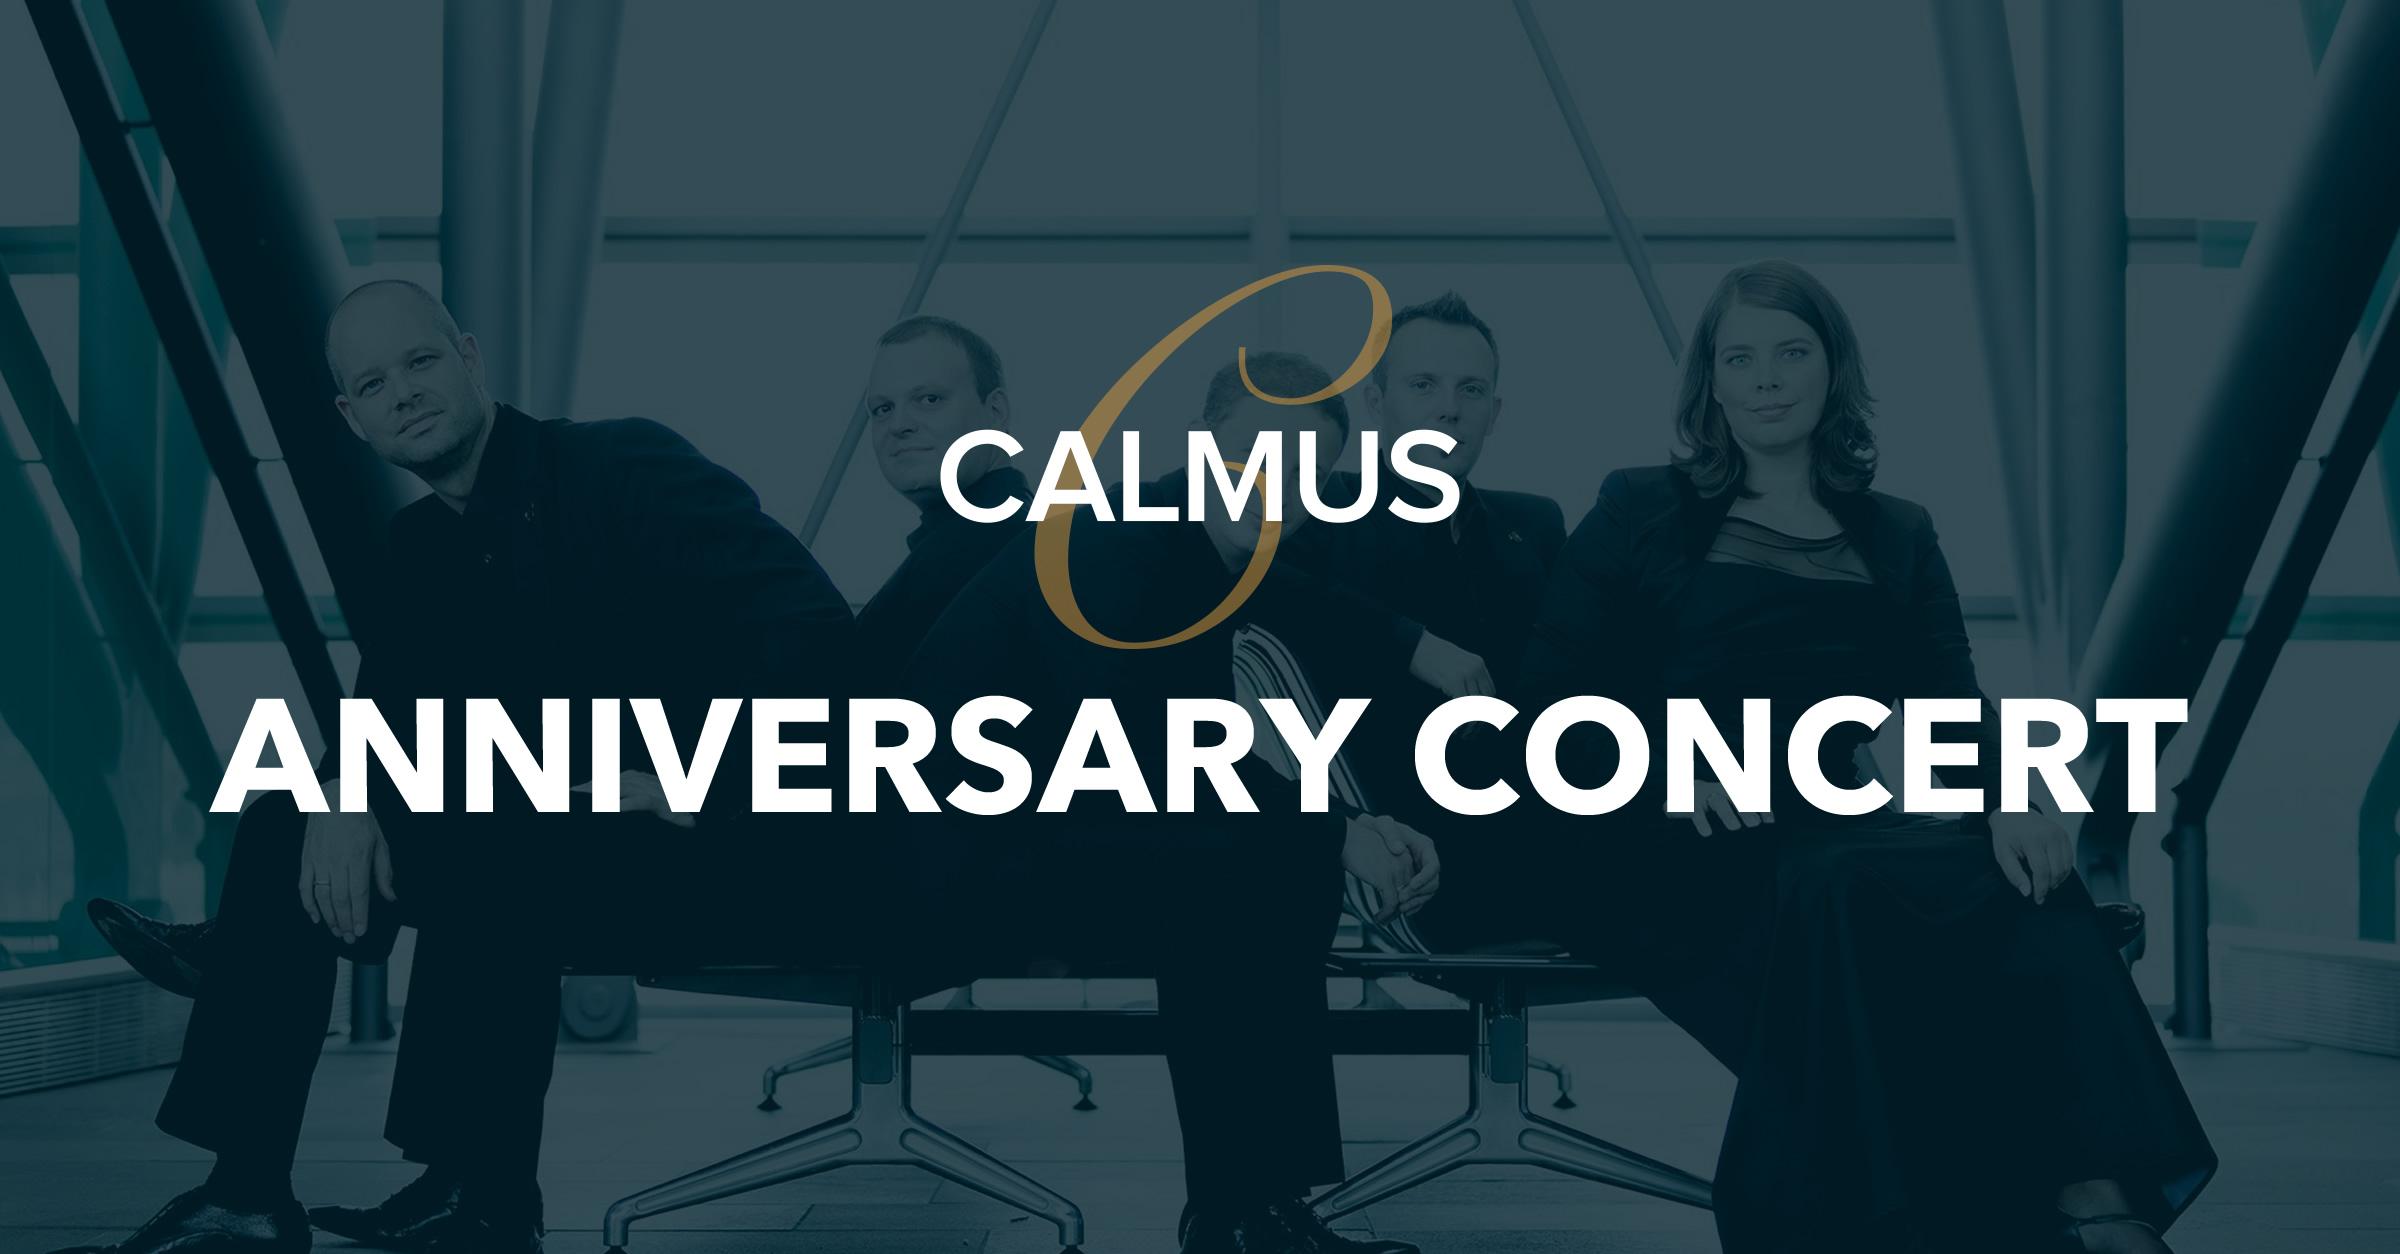 Calmus' 15th Anniversary Concert, Oct 4, 2014